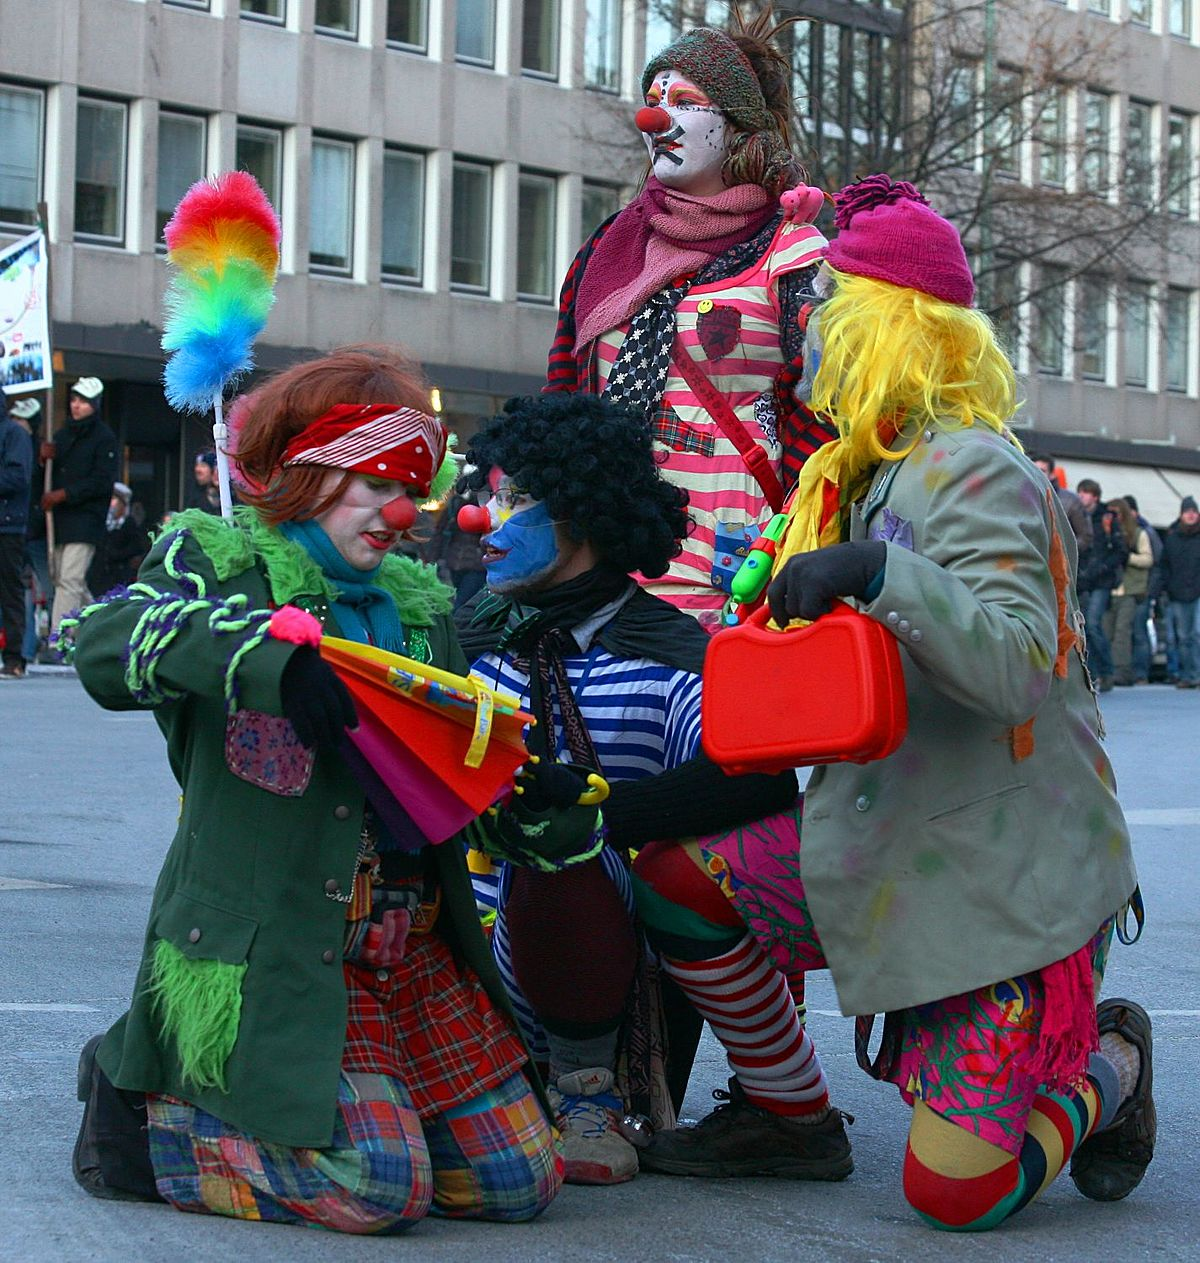 Clandestine Insurgent Rebel Clown Army Wikipedia